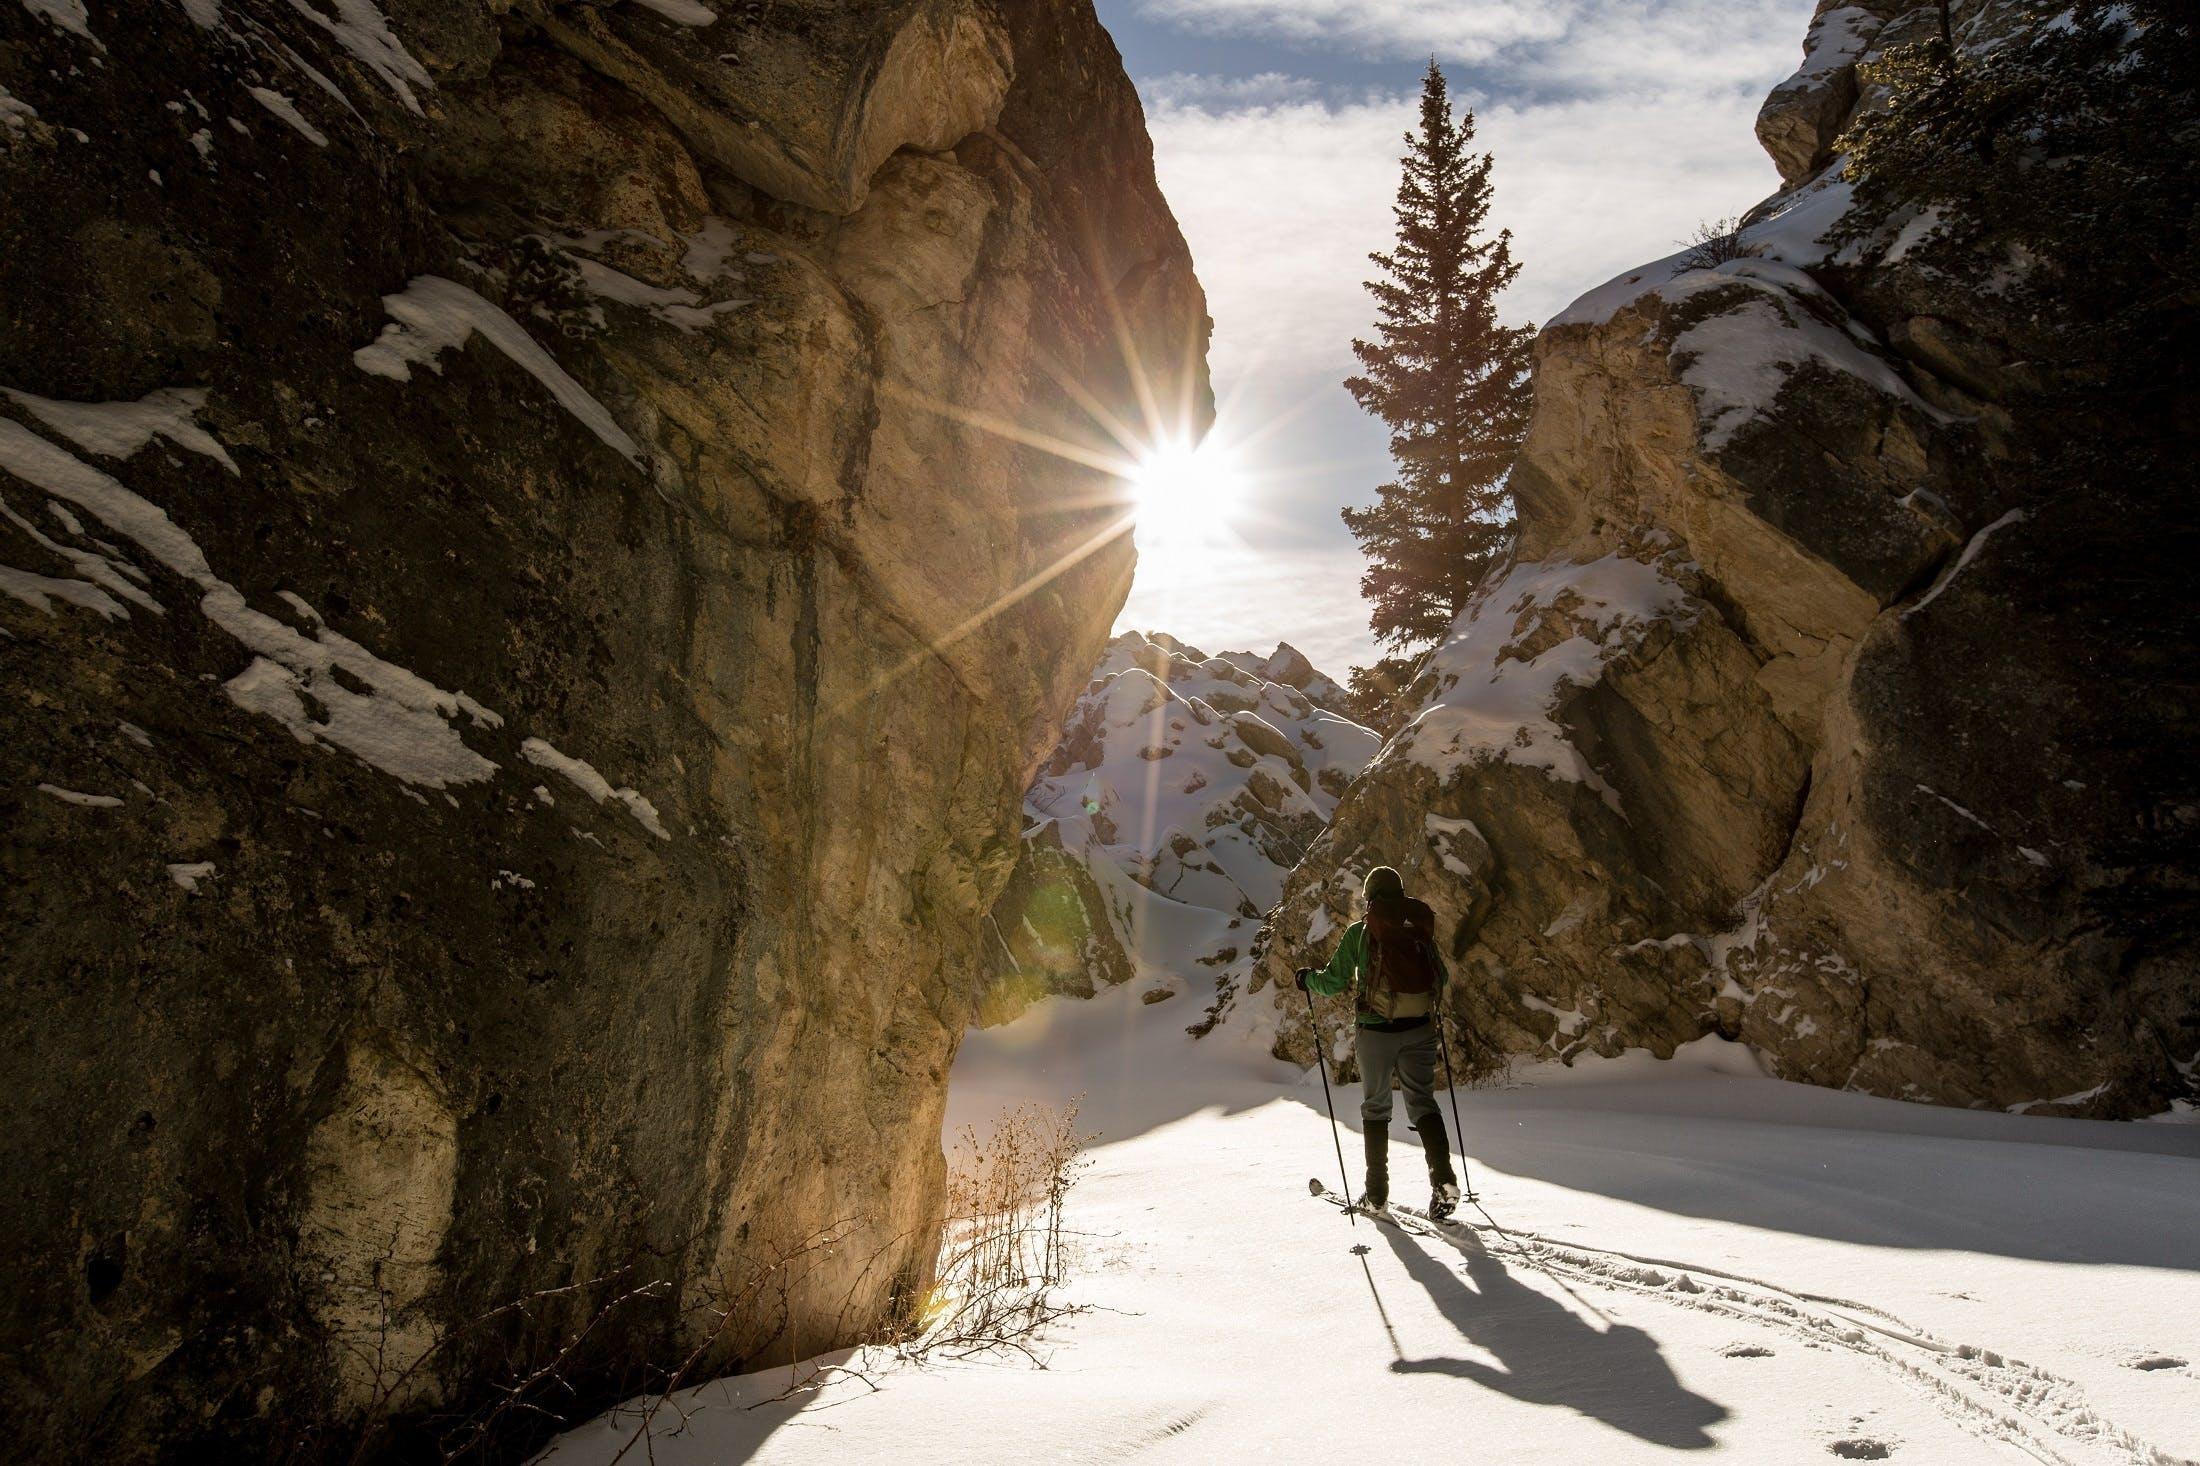 Man Hiking in Snowy Mountain